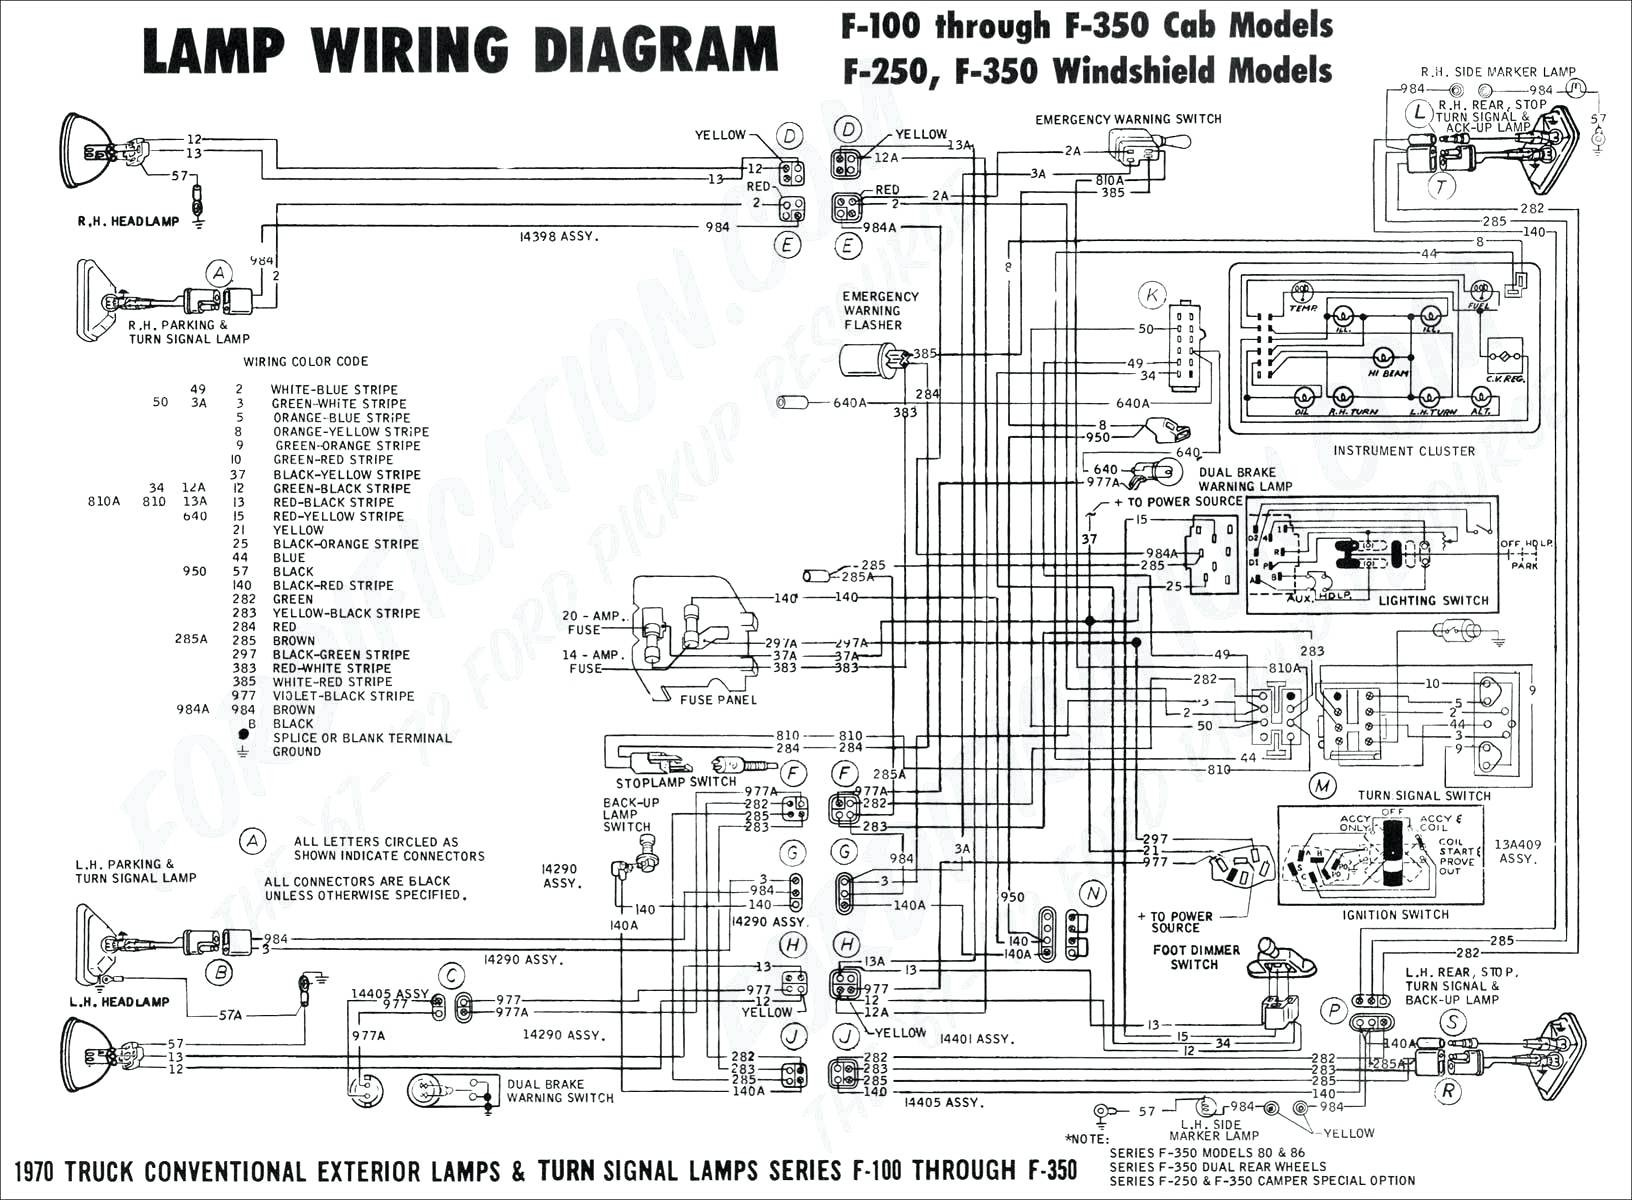 2016 Ram Wiring Diagram Dodge 2500 Trailer Wiring Diagram Wiring Diagram Data Of 2016 Ram Wiring Diagram